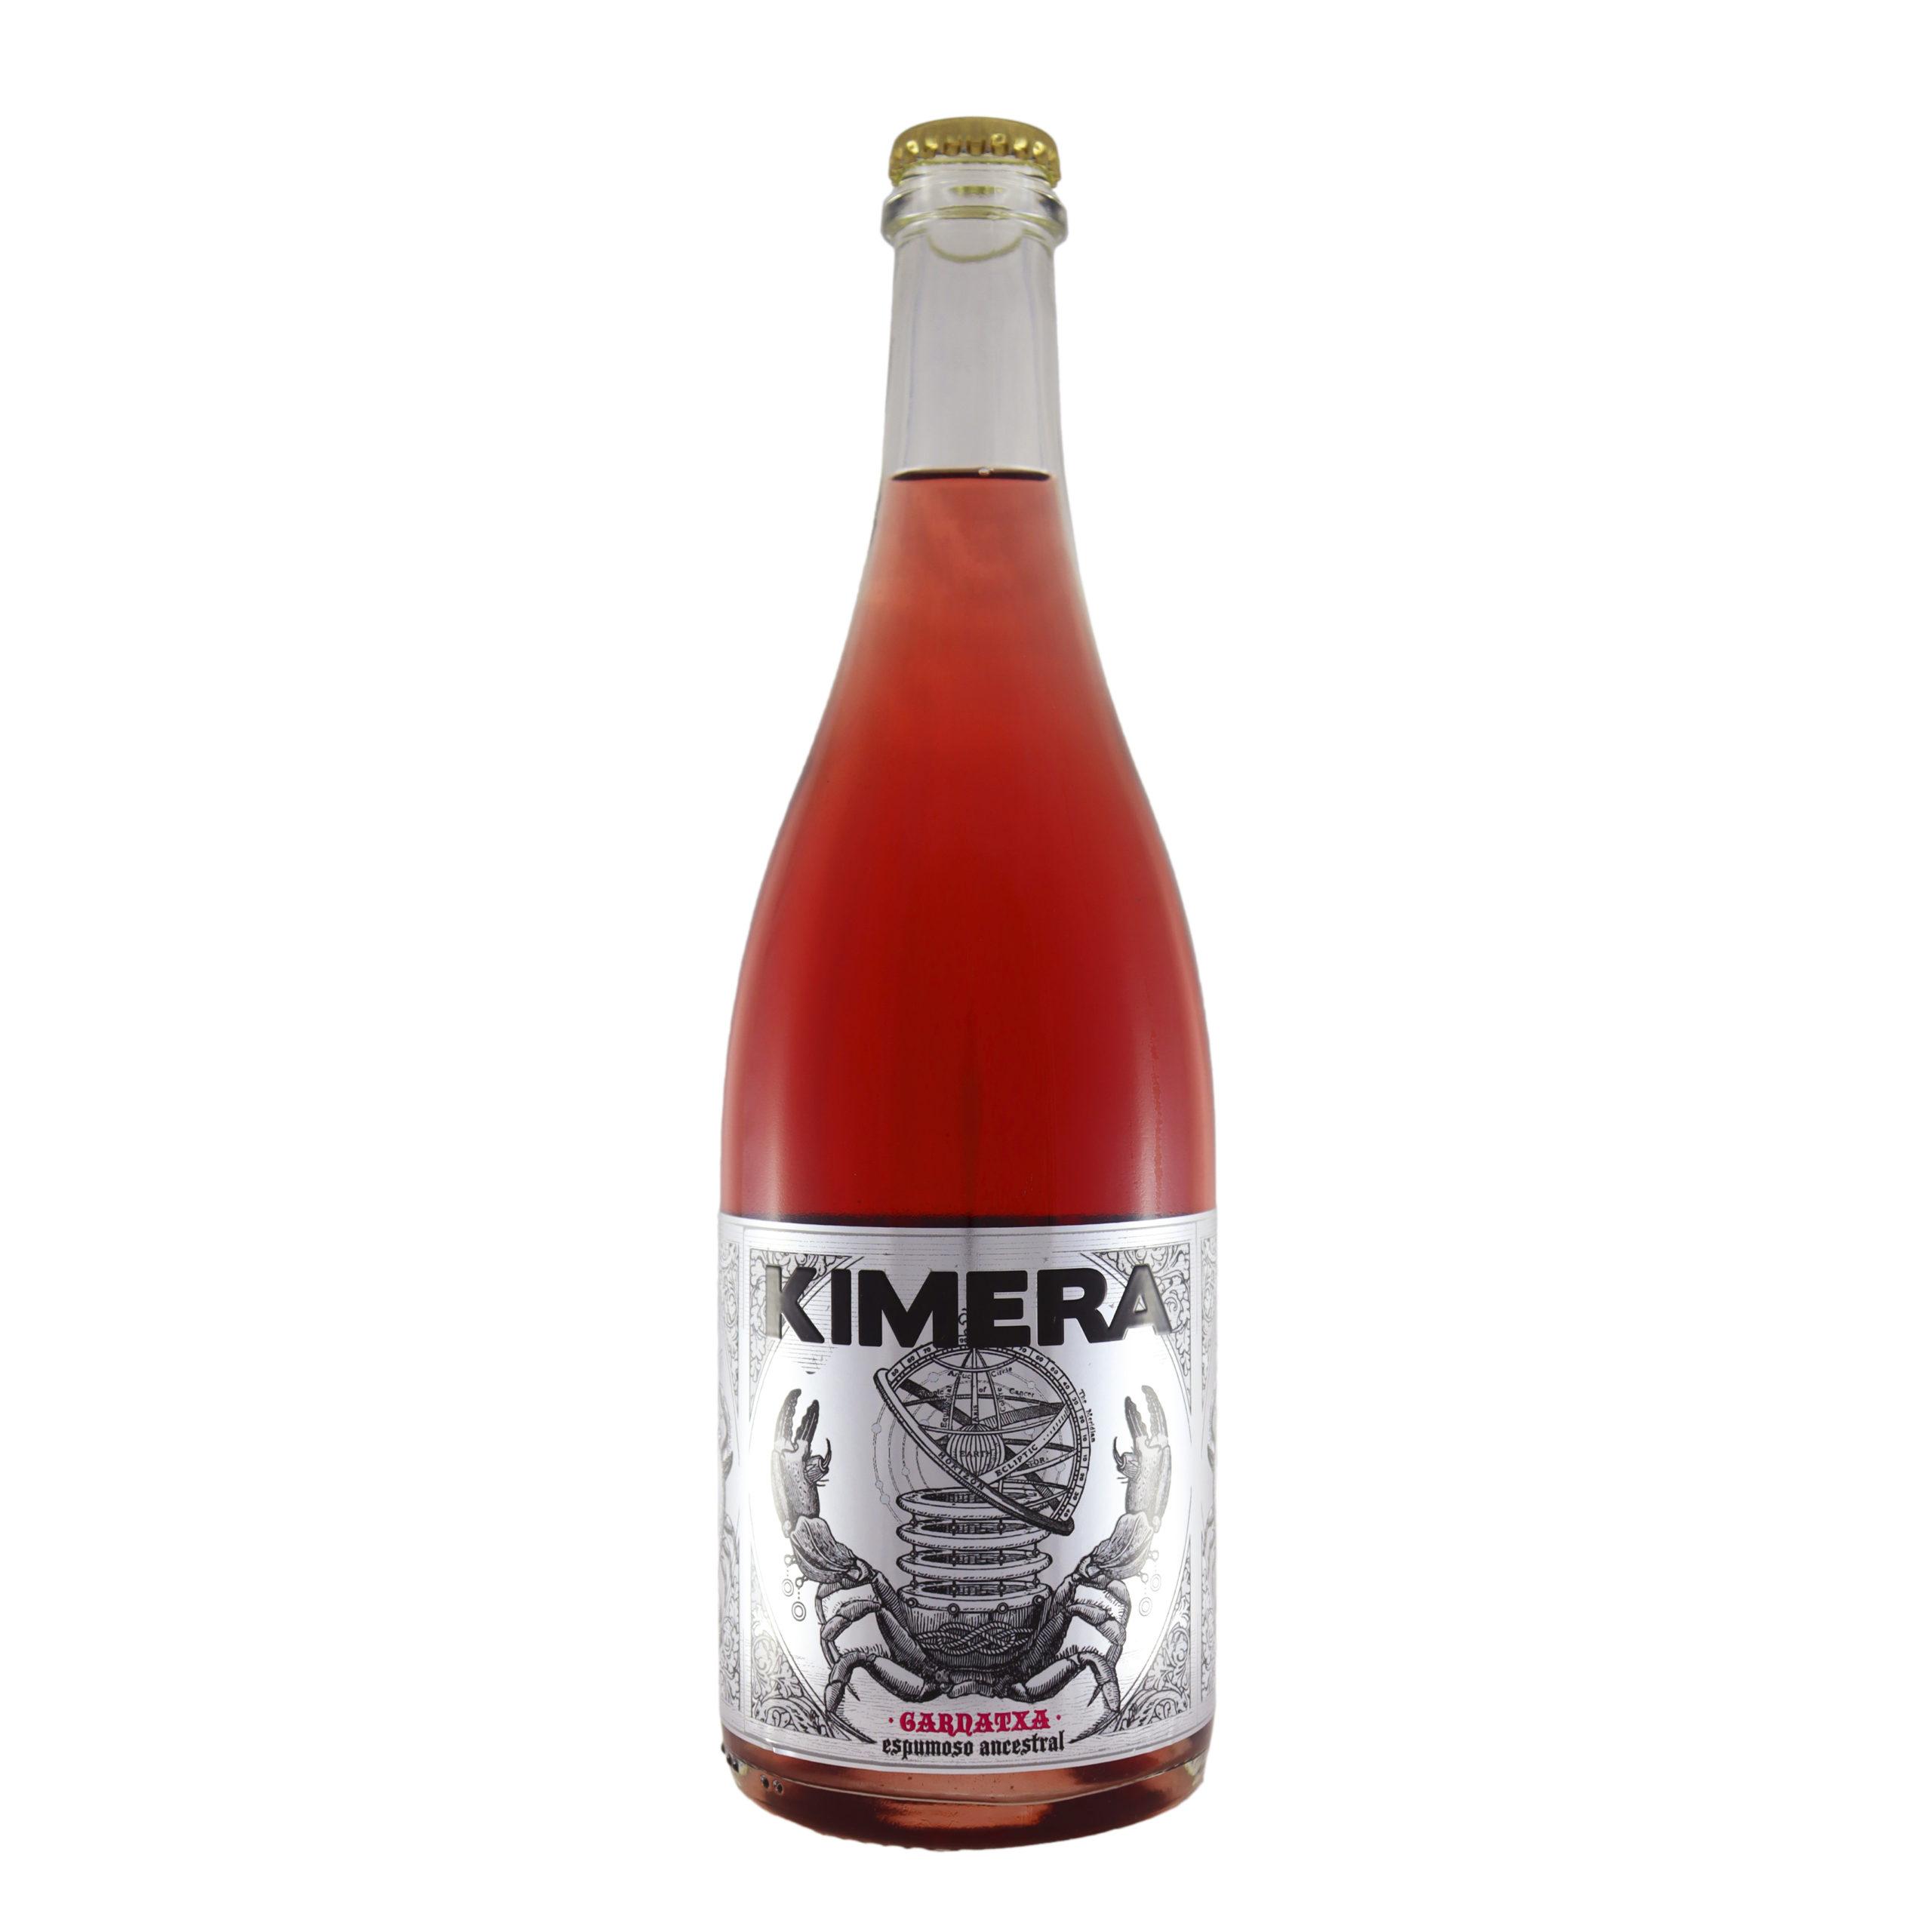 Kimera ancestral